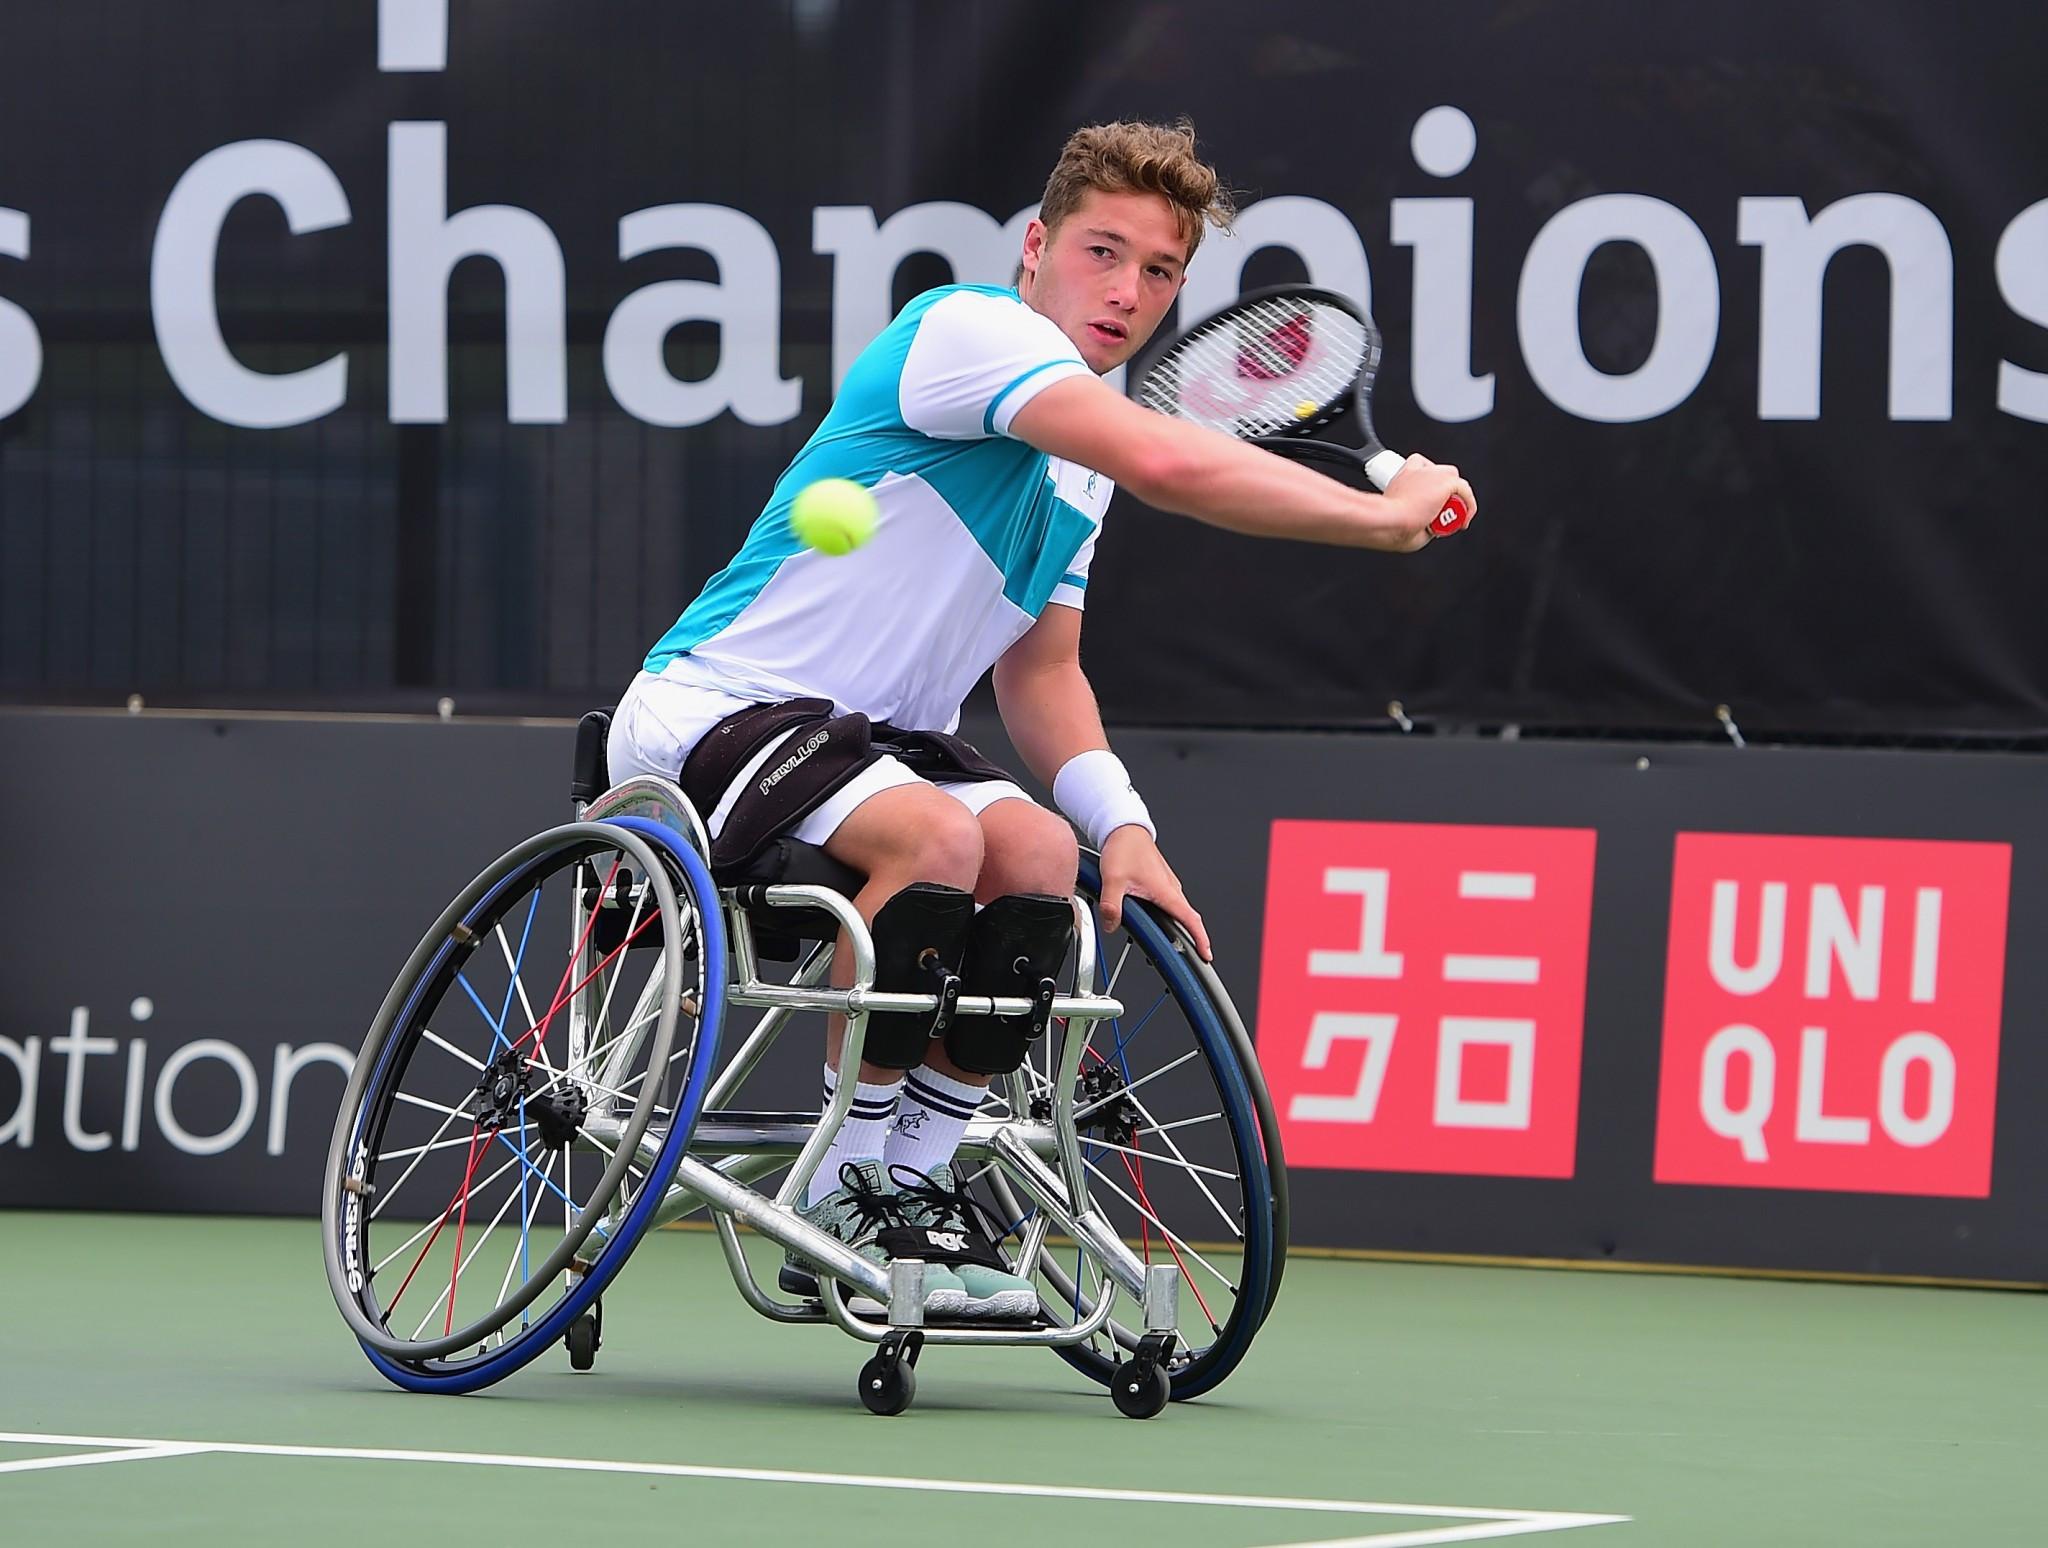 Hewett defeats Reid in British Open Wheelchair Tennis Championships semi-final